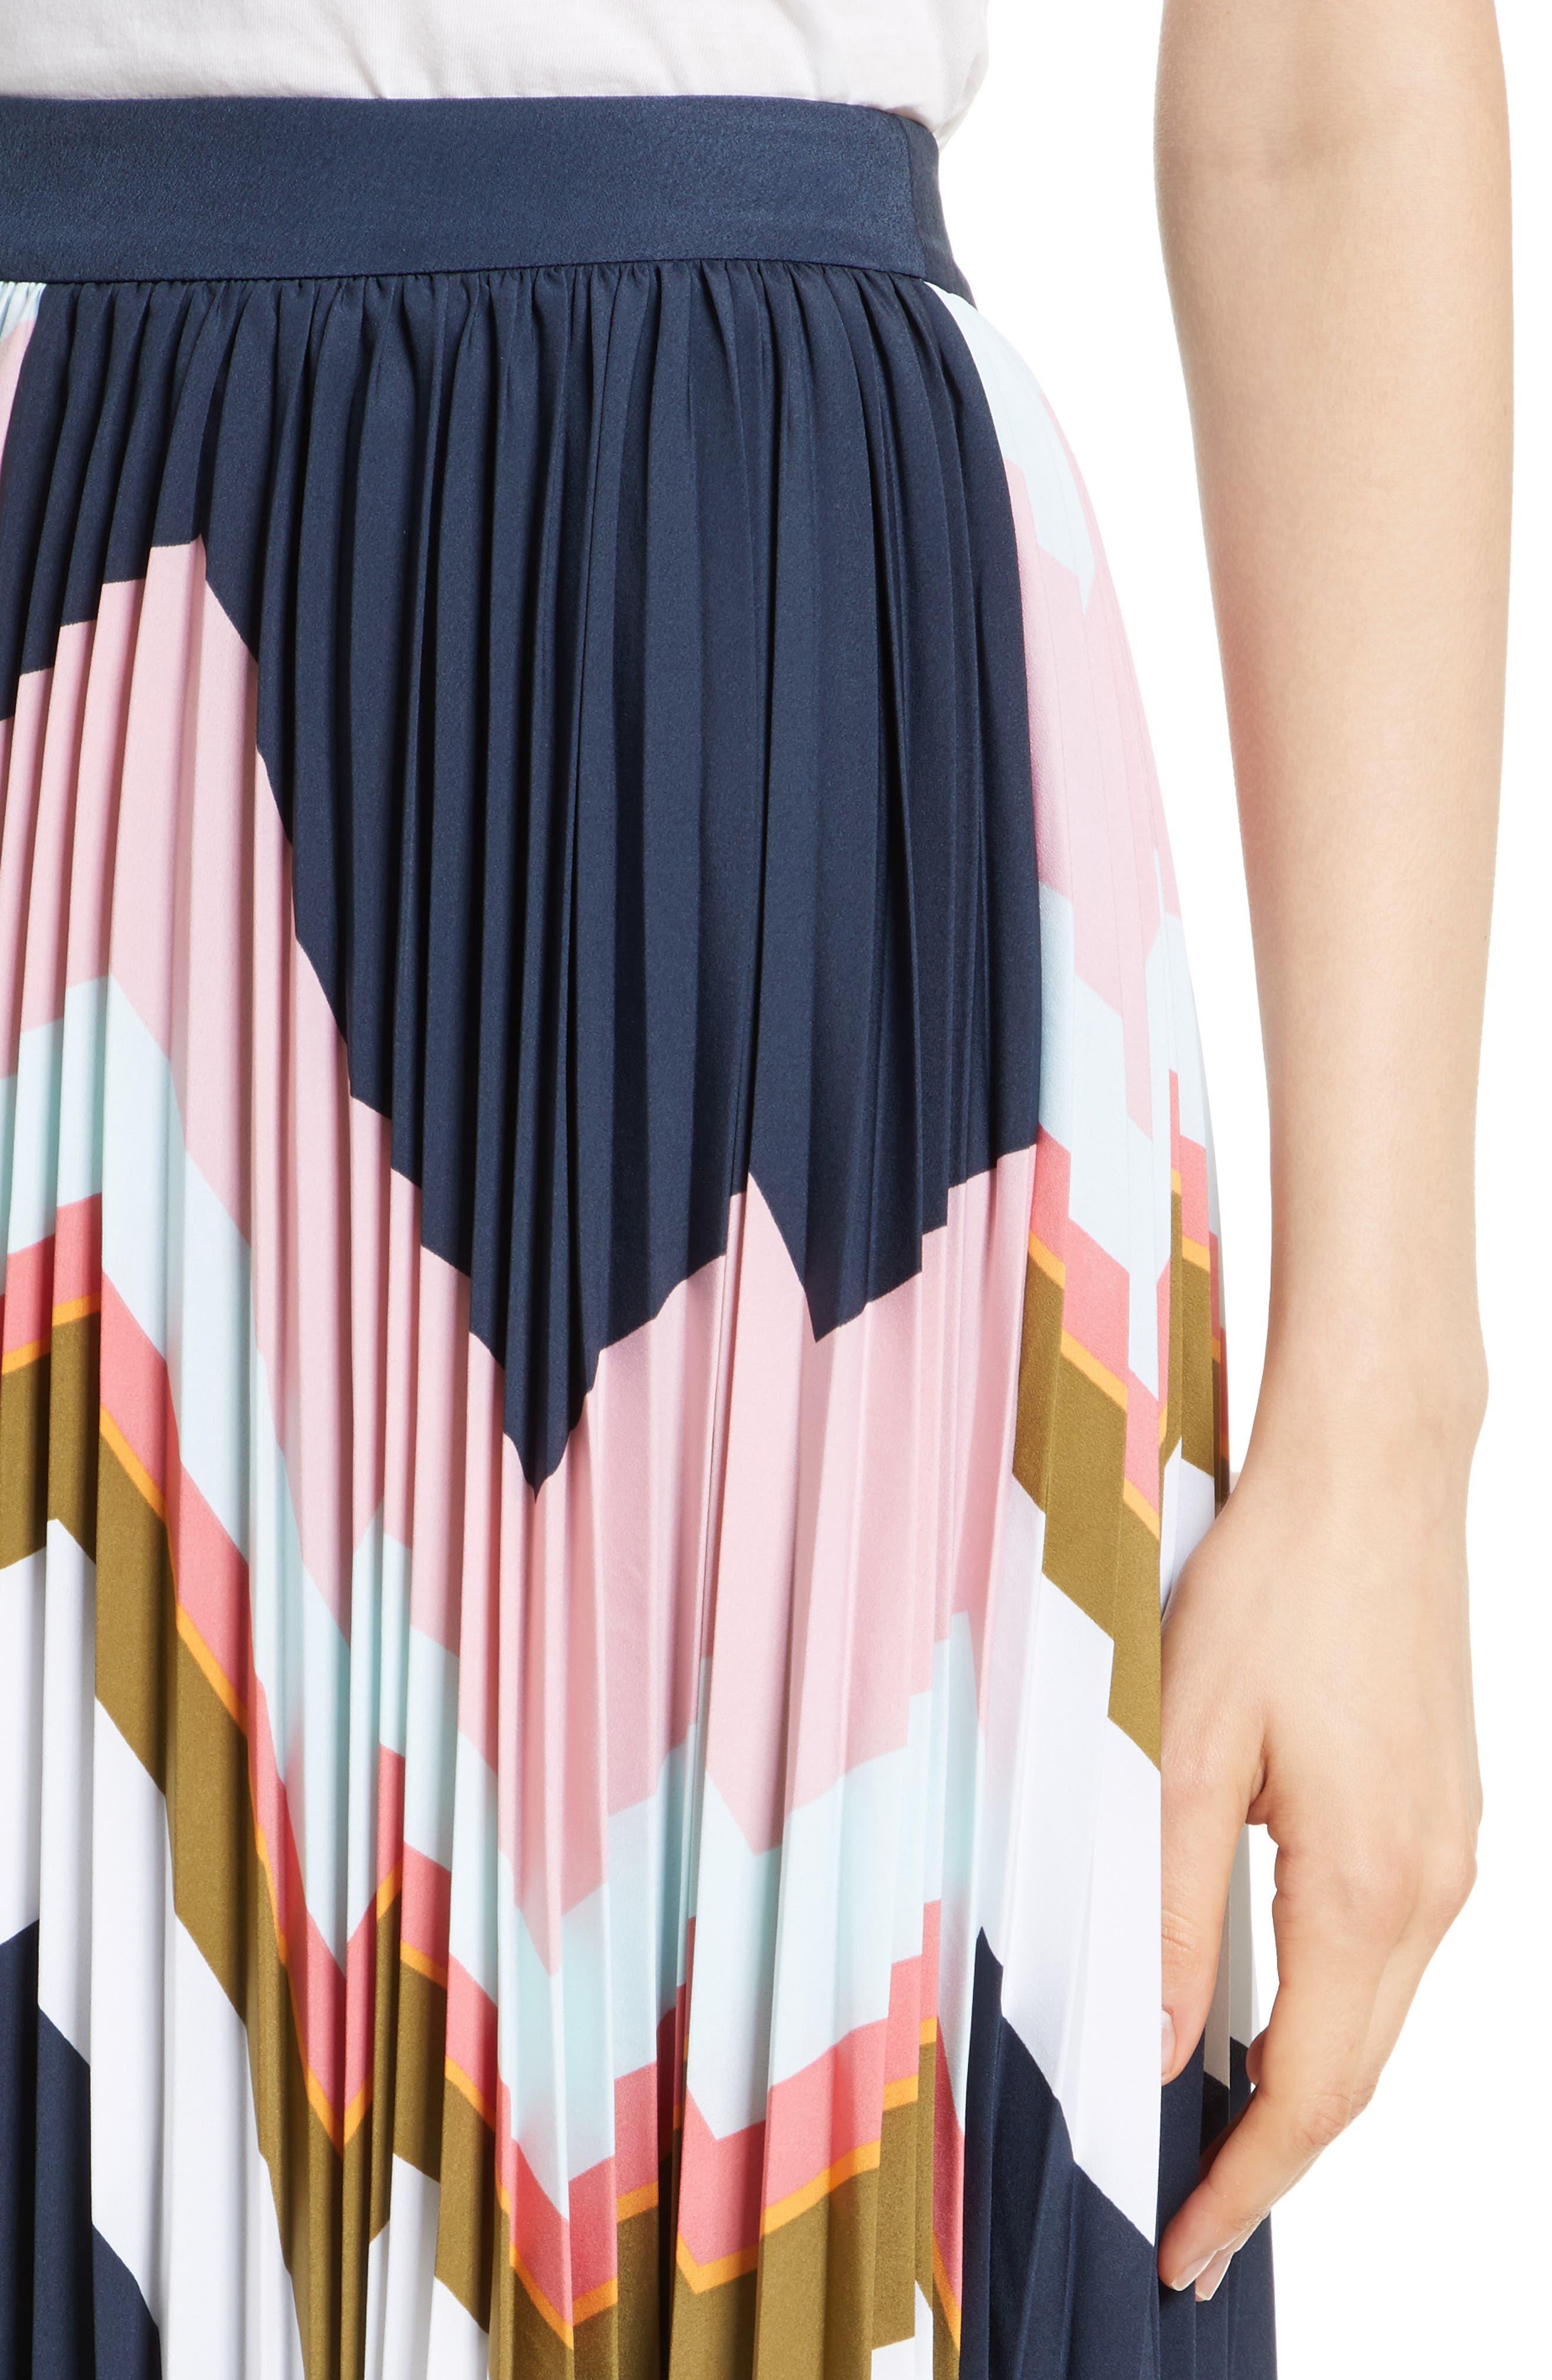 Evianna Mississippi Print Pleated Skirt,                             Alternate thumbnail 4, color,                             Navy